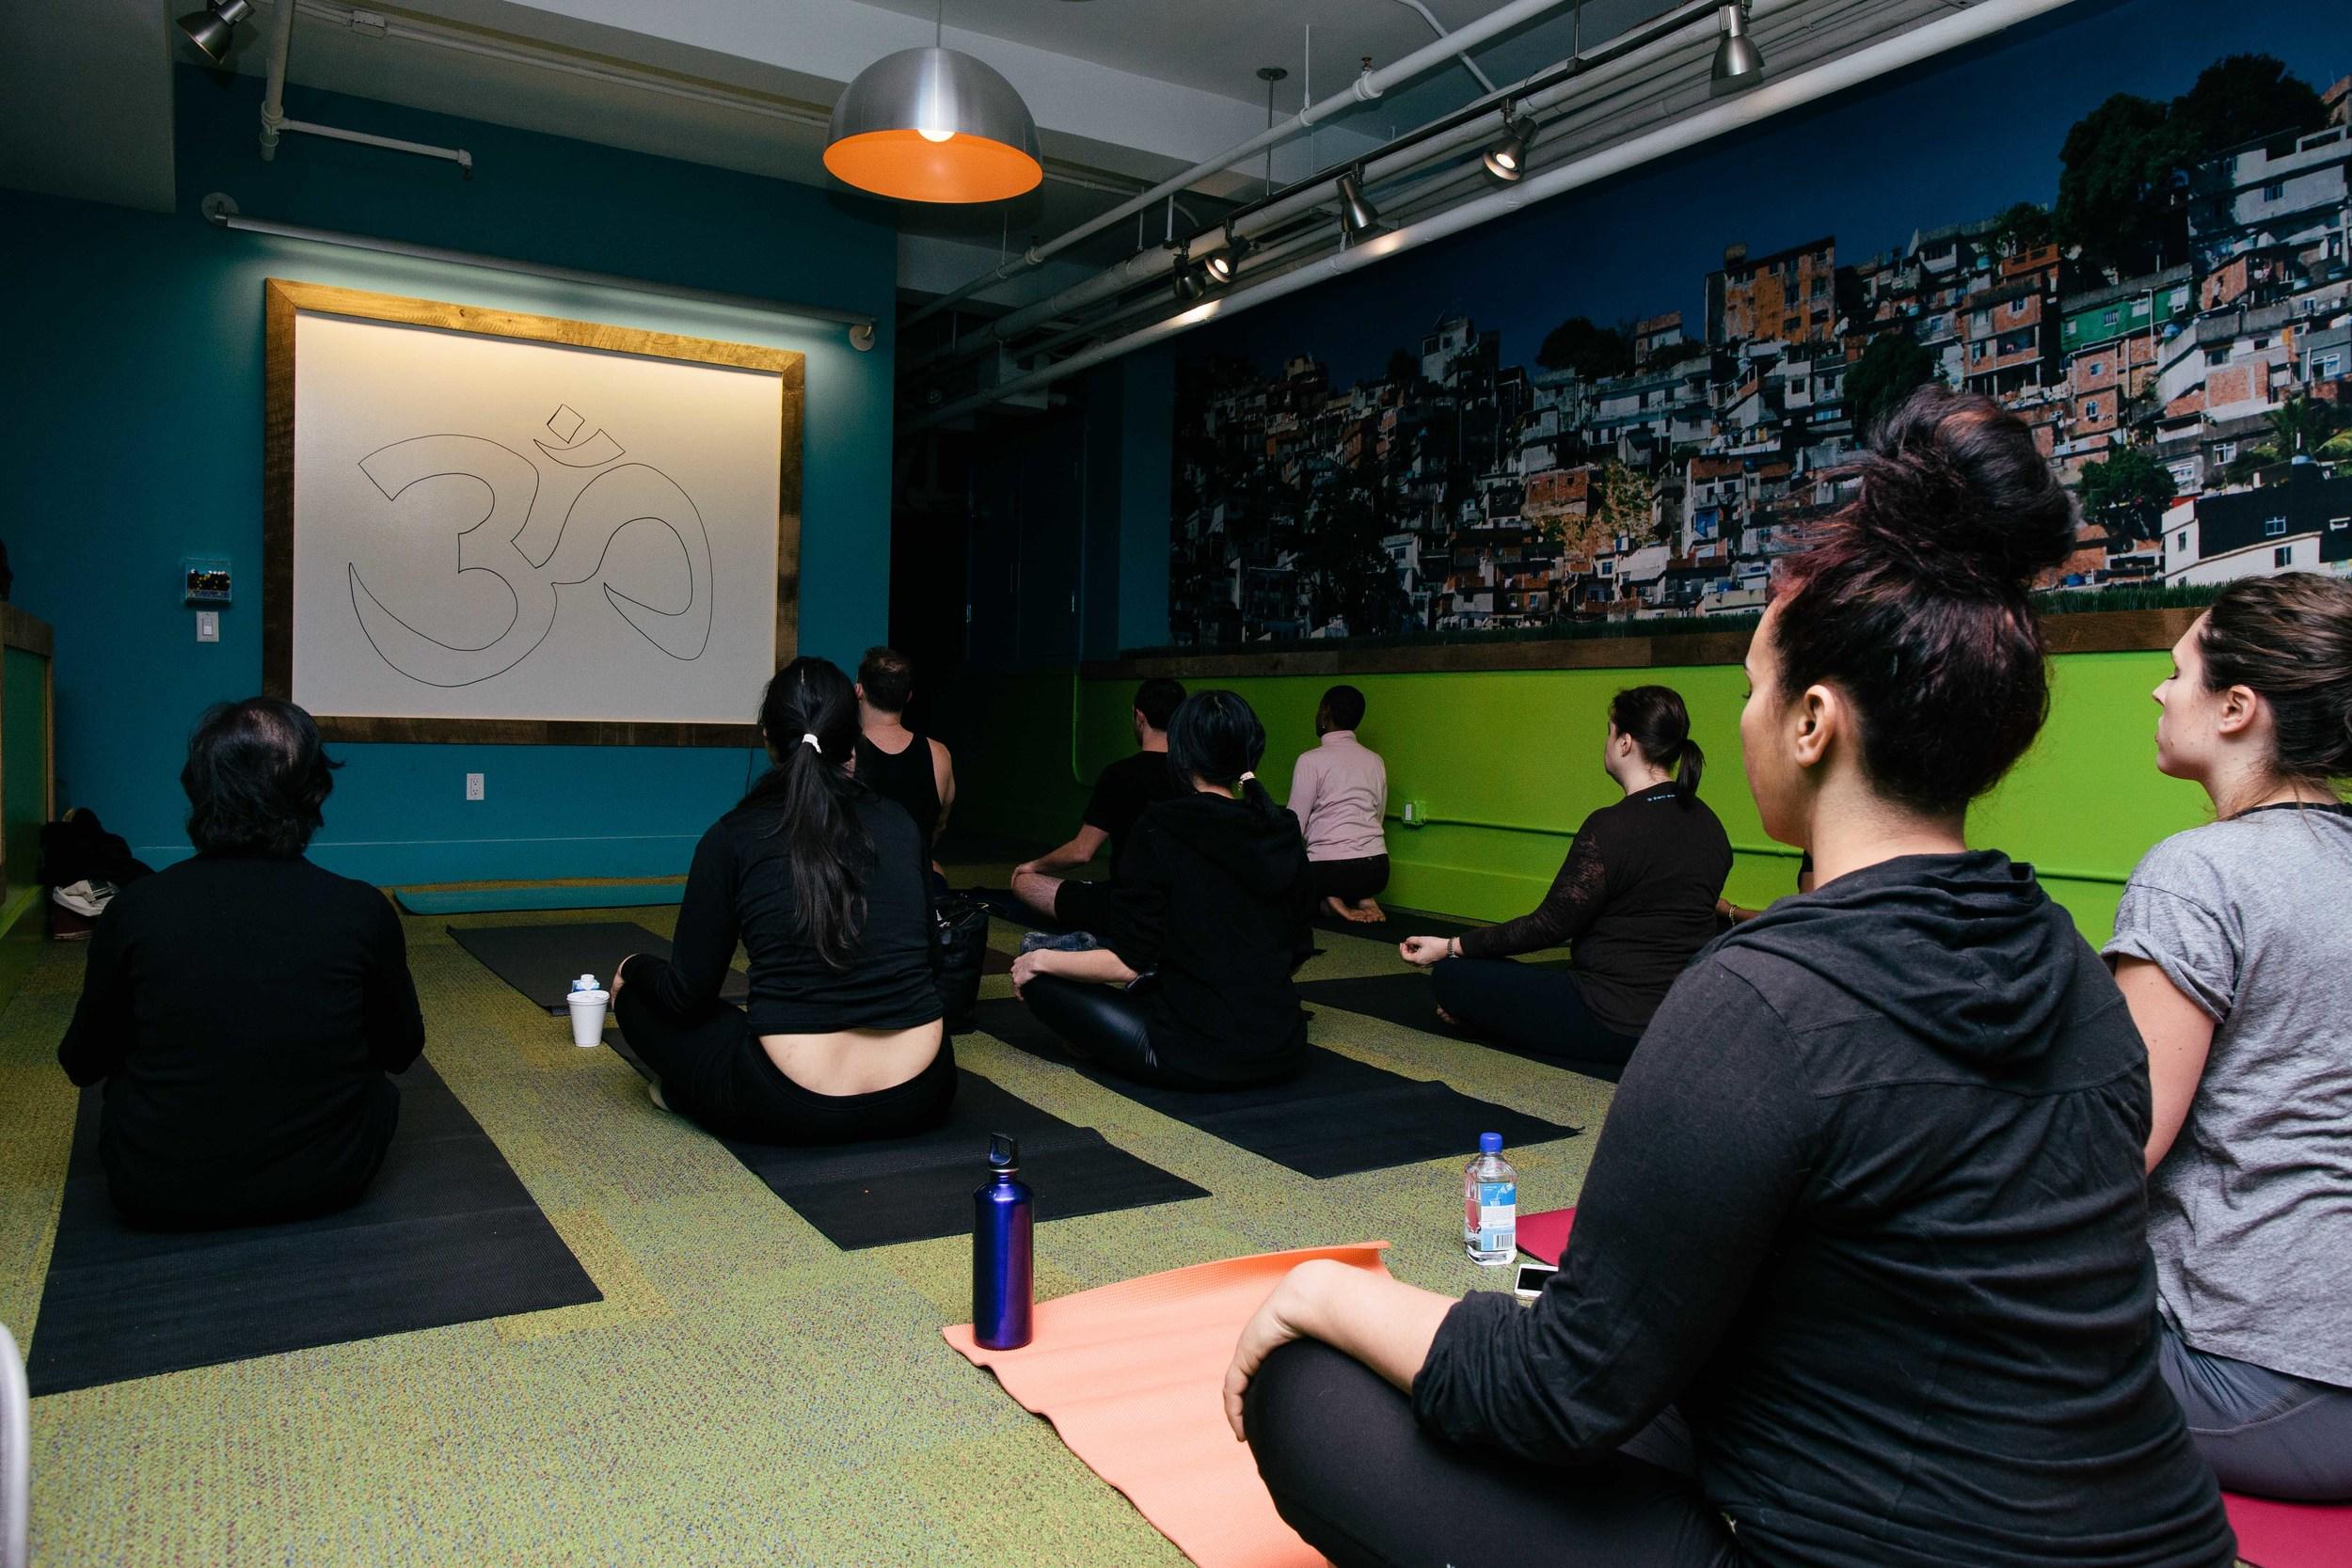 meditation session for professionals at our partner venue, offsite.